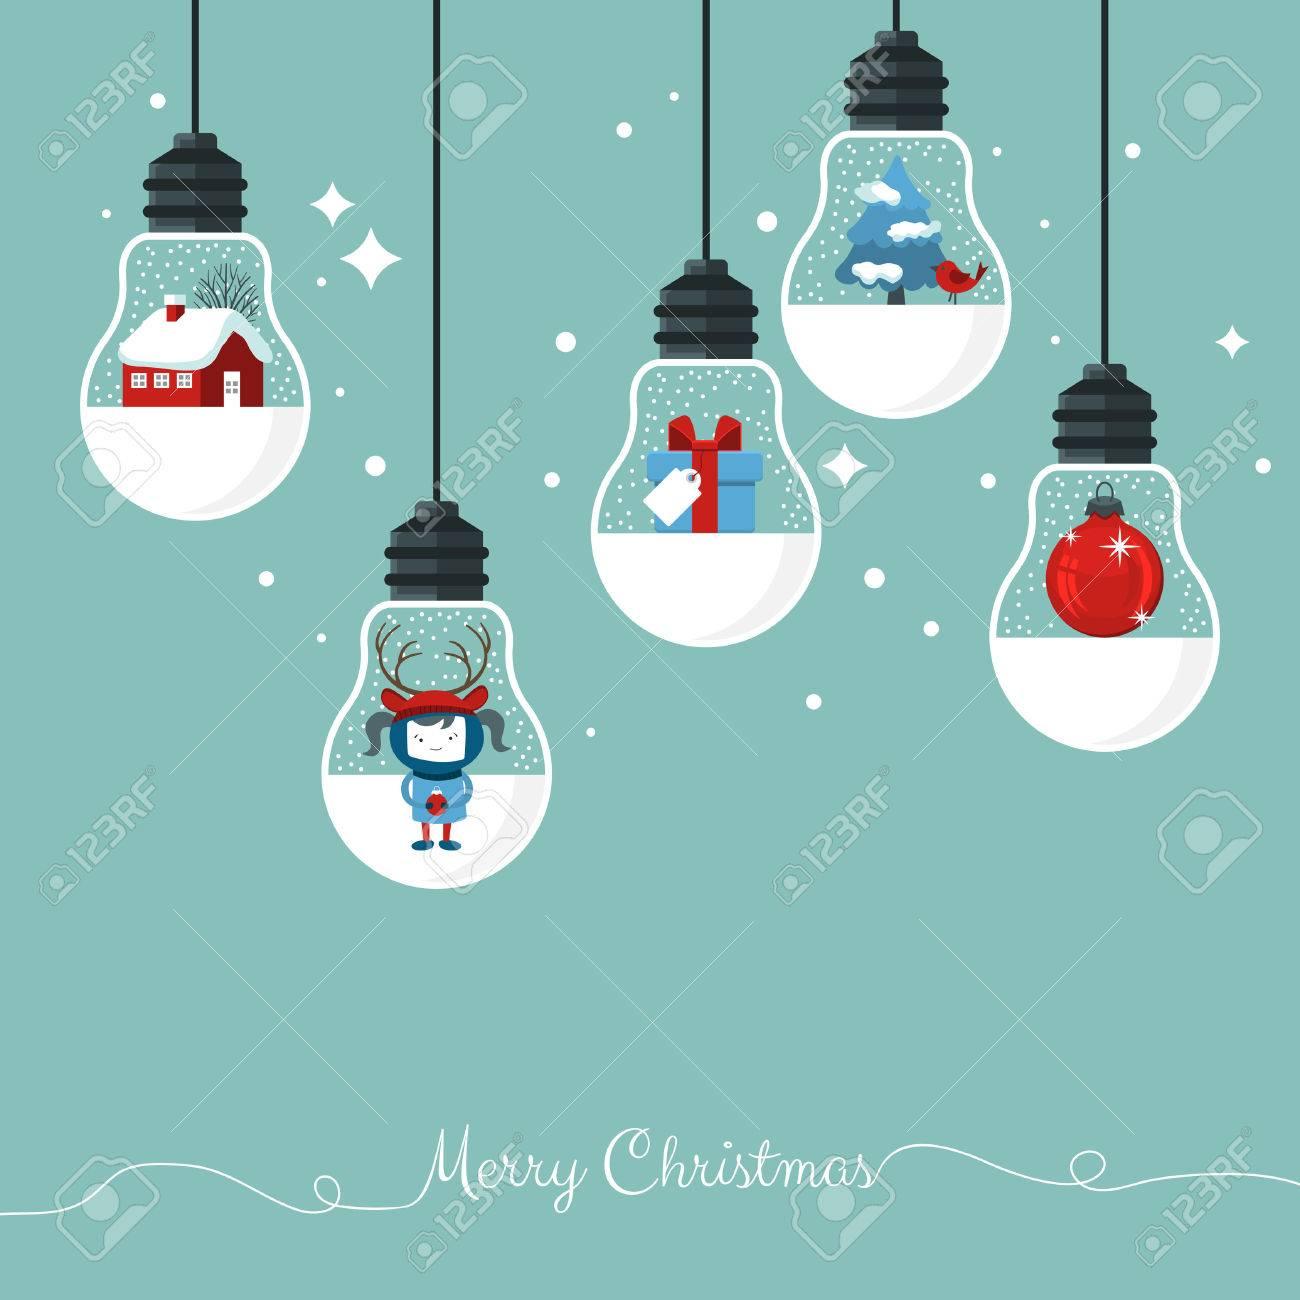 Modern Christmas Card Flat Stylish Design. Creative Design With ...